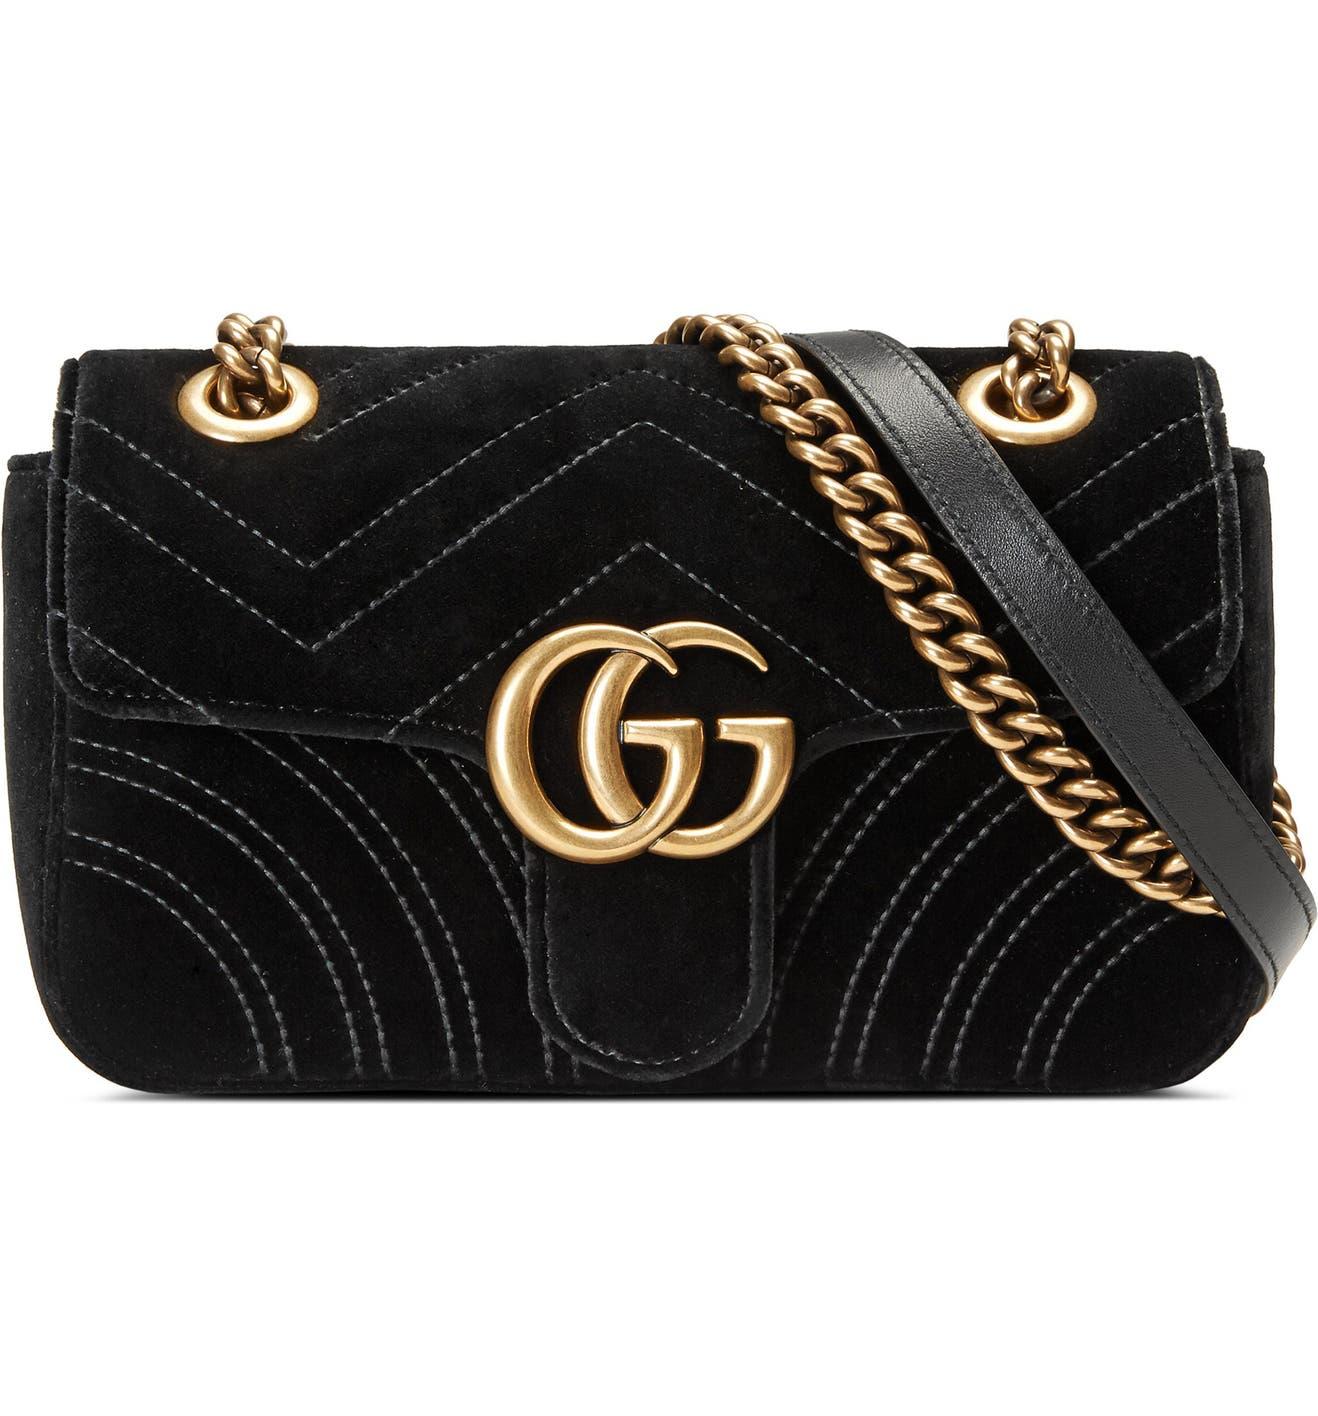 effc6b6ea4b3 Gucci Small GG Marmont 2.0 Matelassé Velvet Shoulder Bag | Nordstrom